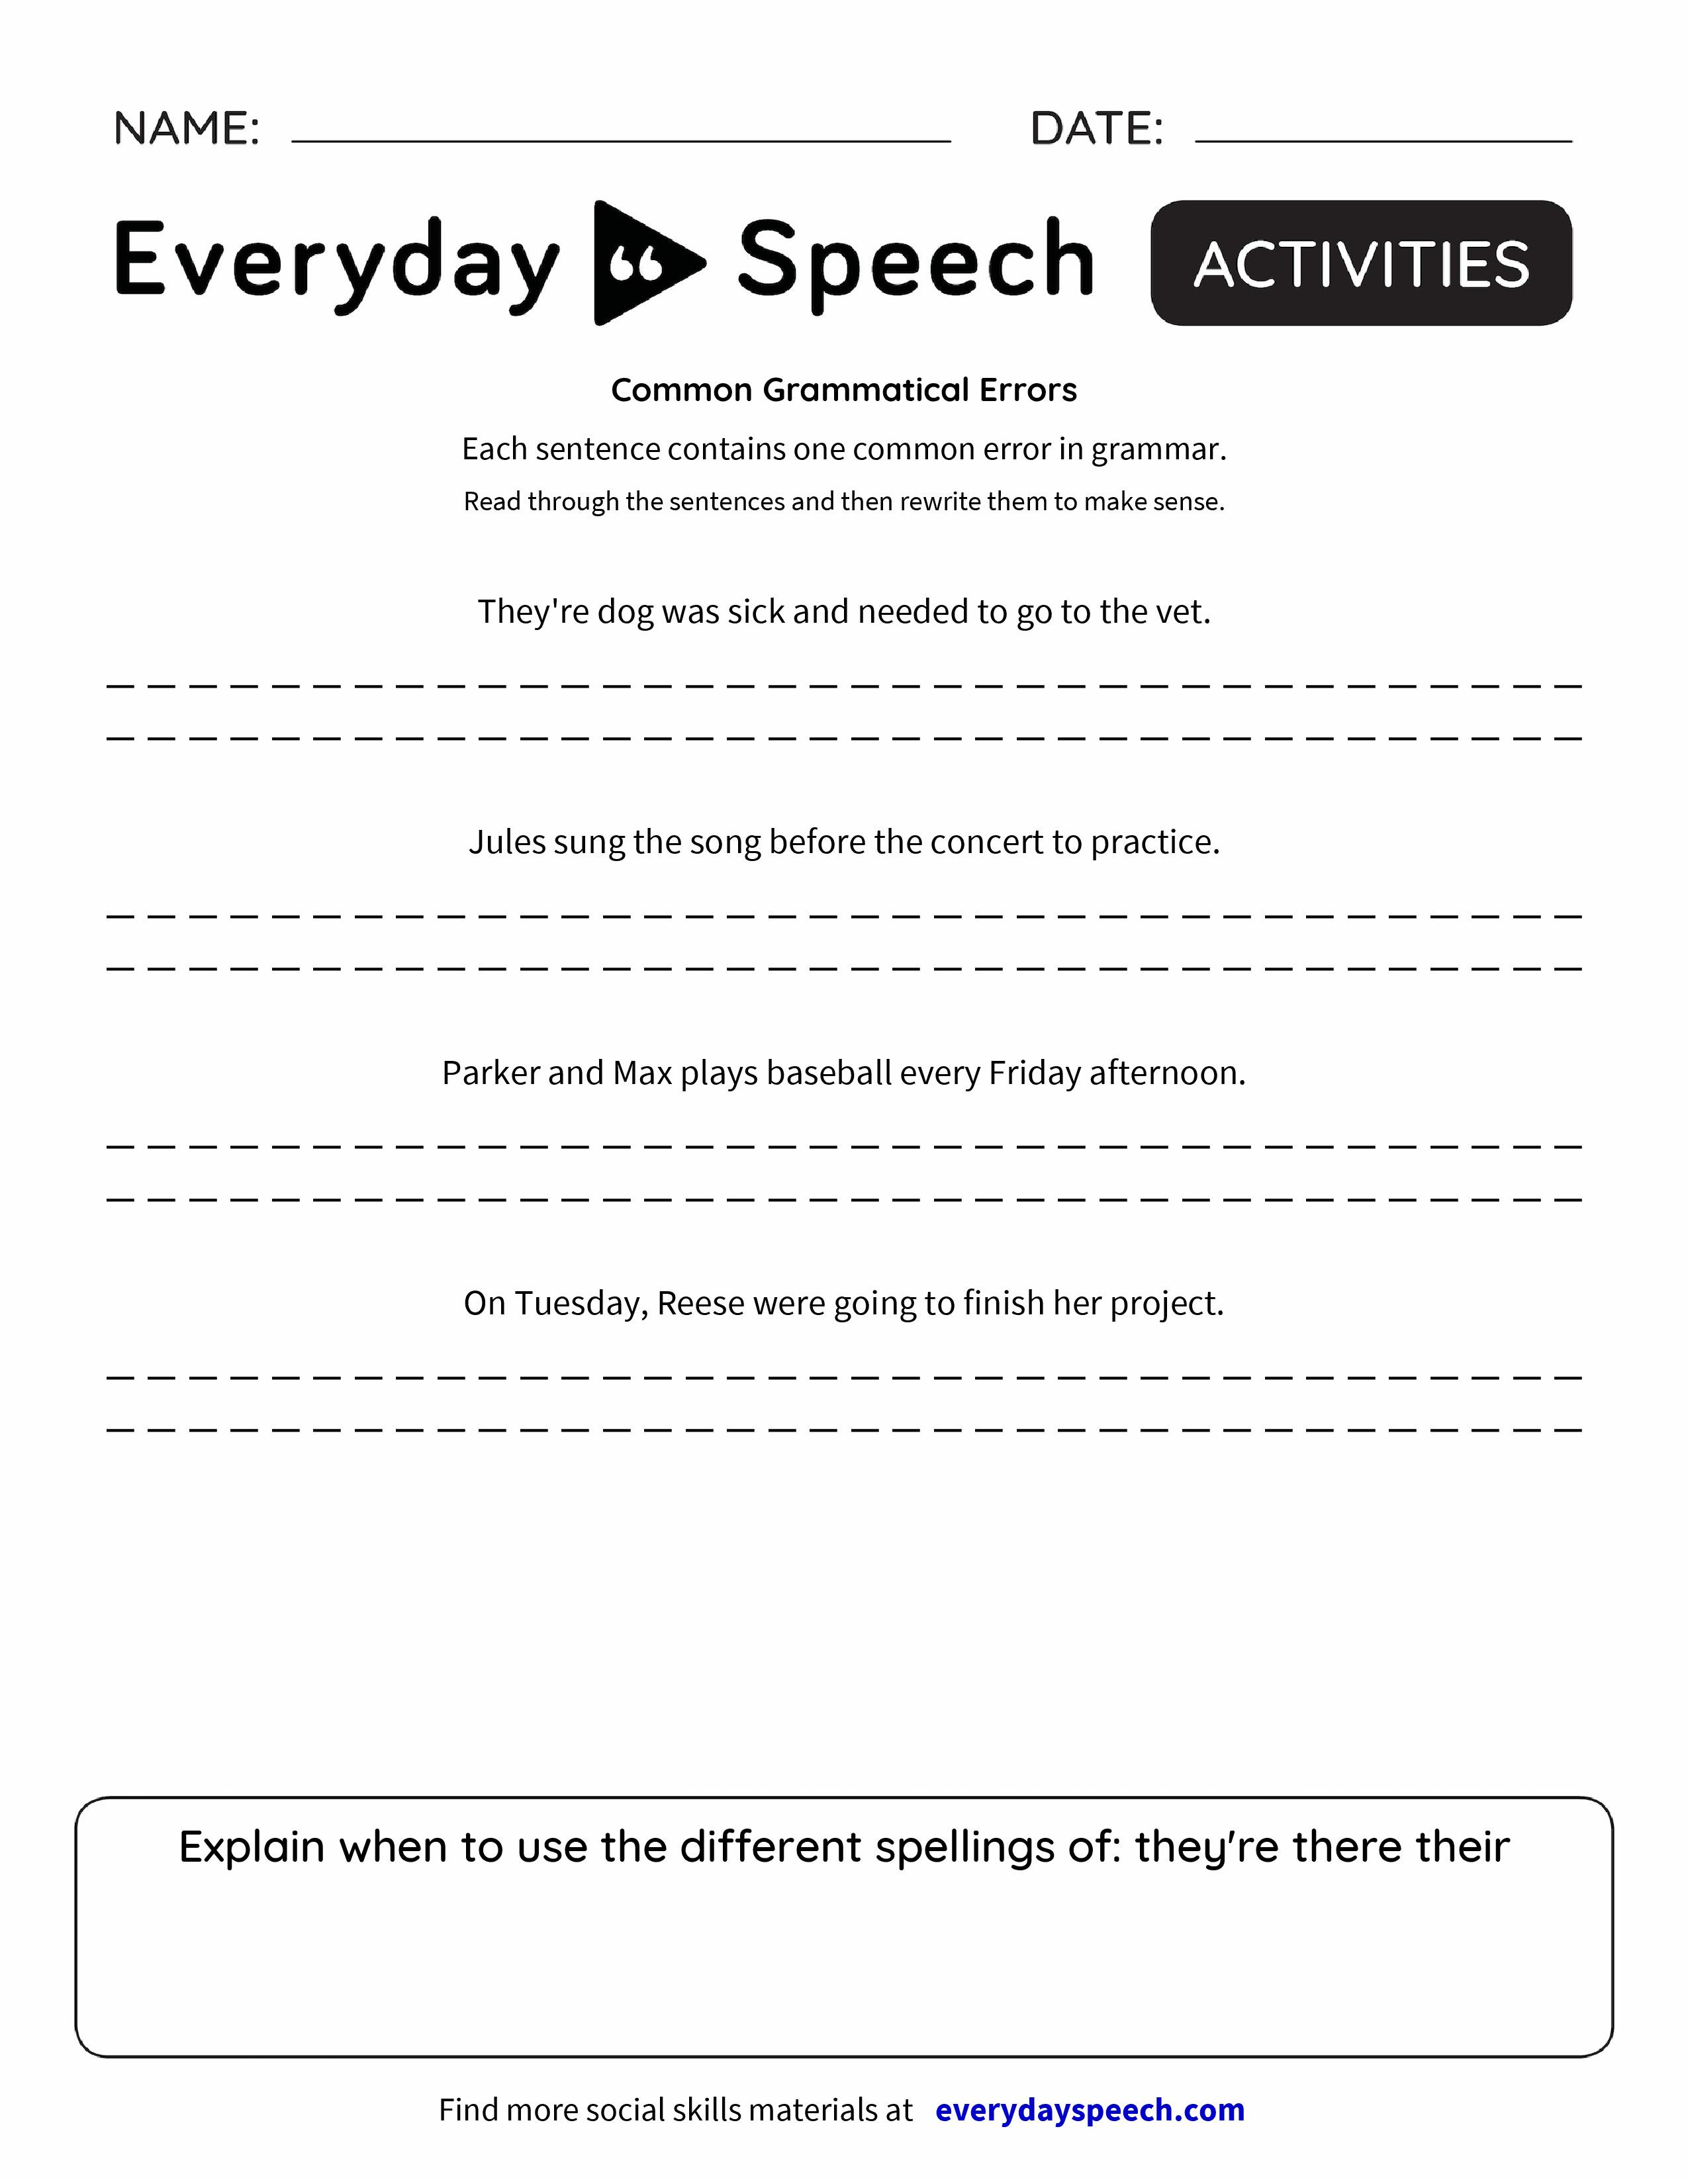 Common Grammatical Errors Everyday Speech Everyday Speech